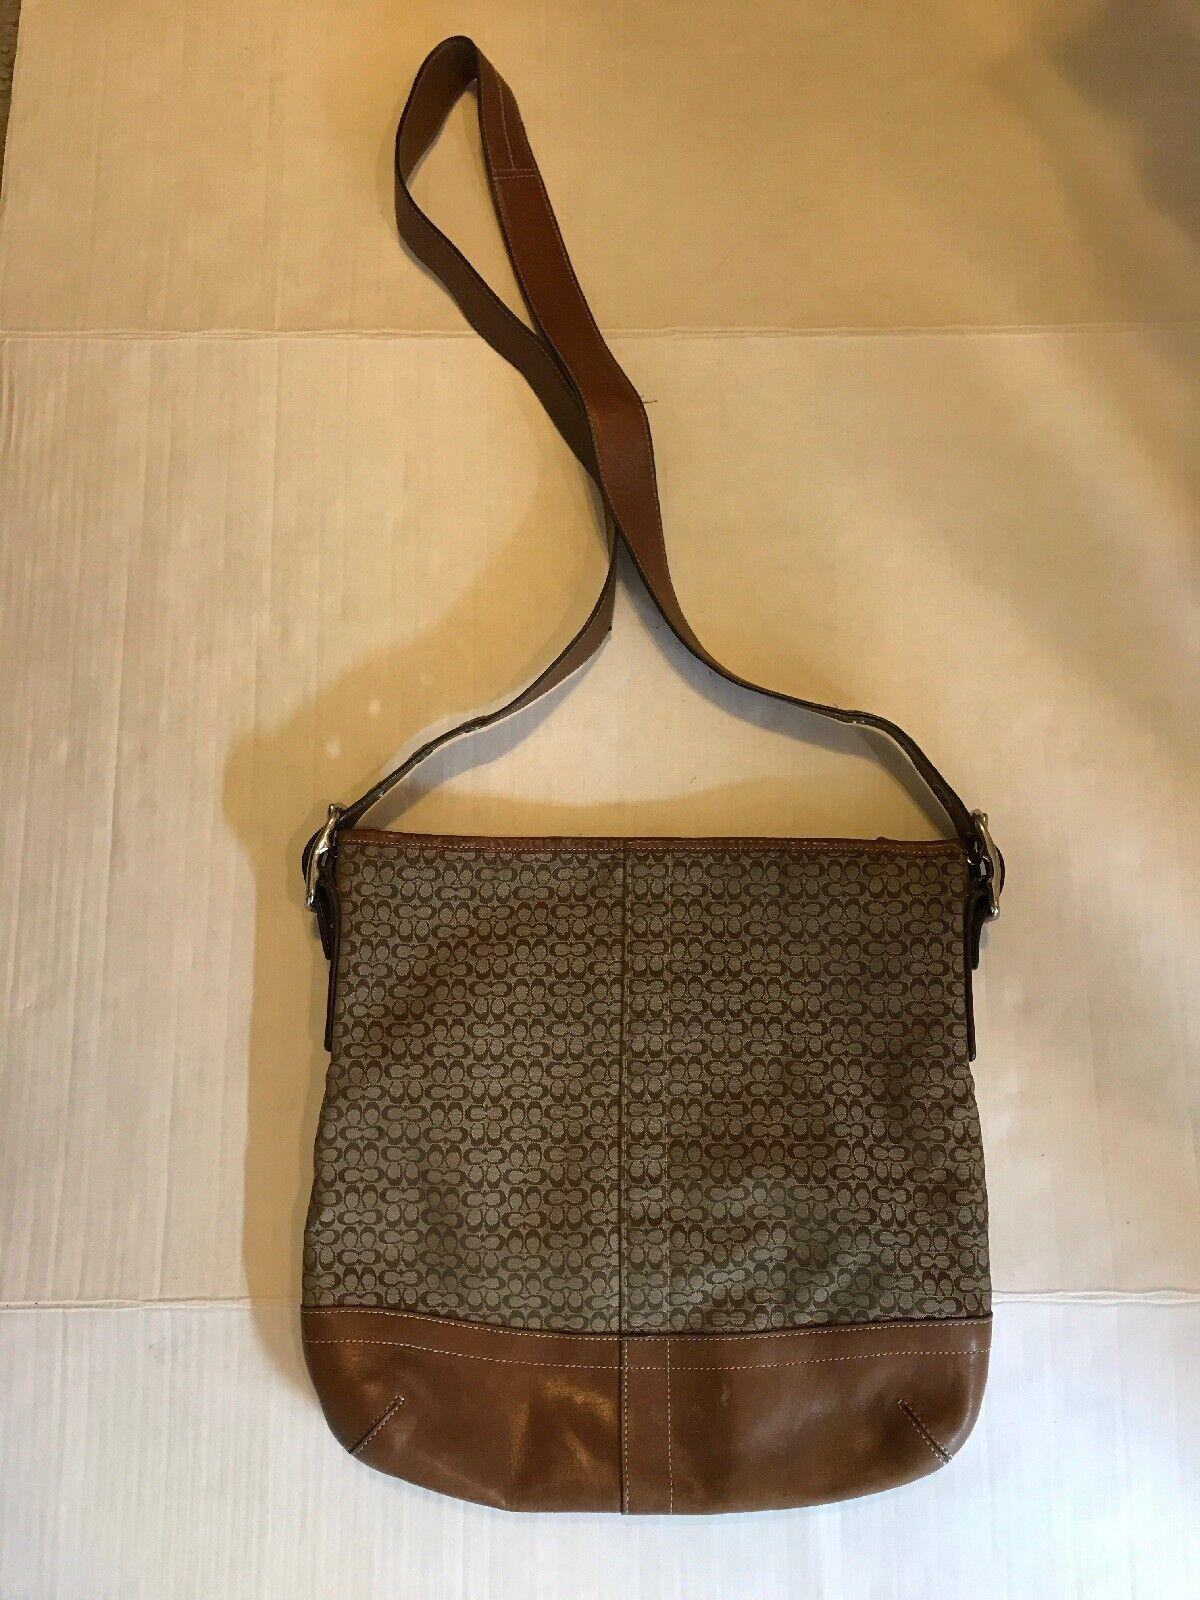 Coach Monogram Canvas Tan Crossbody/Shoulder Bag - image 2